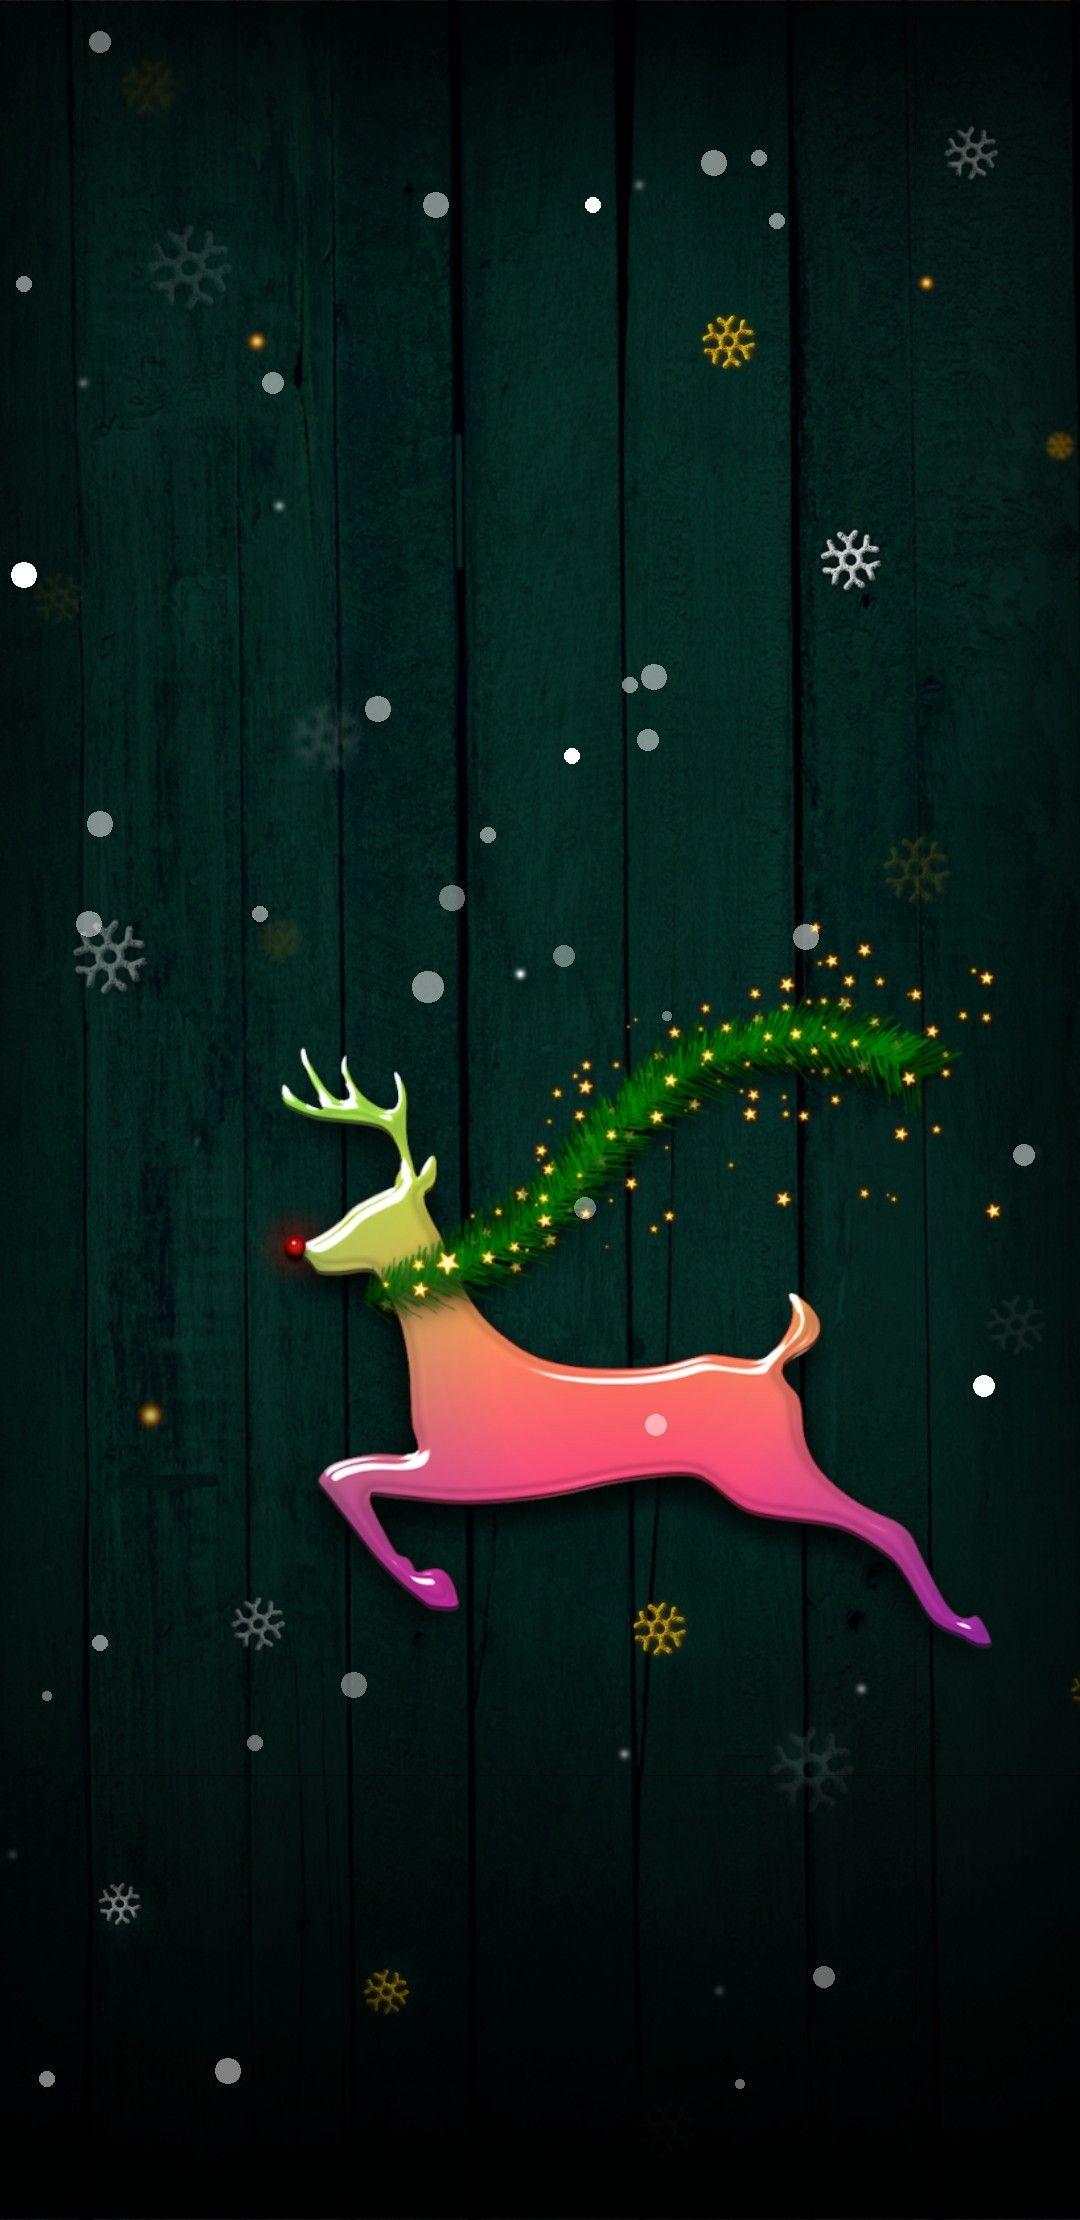 Rudolph Christmas Wallpaper Wallpaper Iphone Christmas Cute